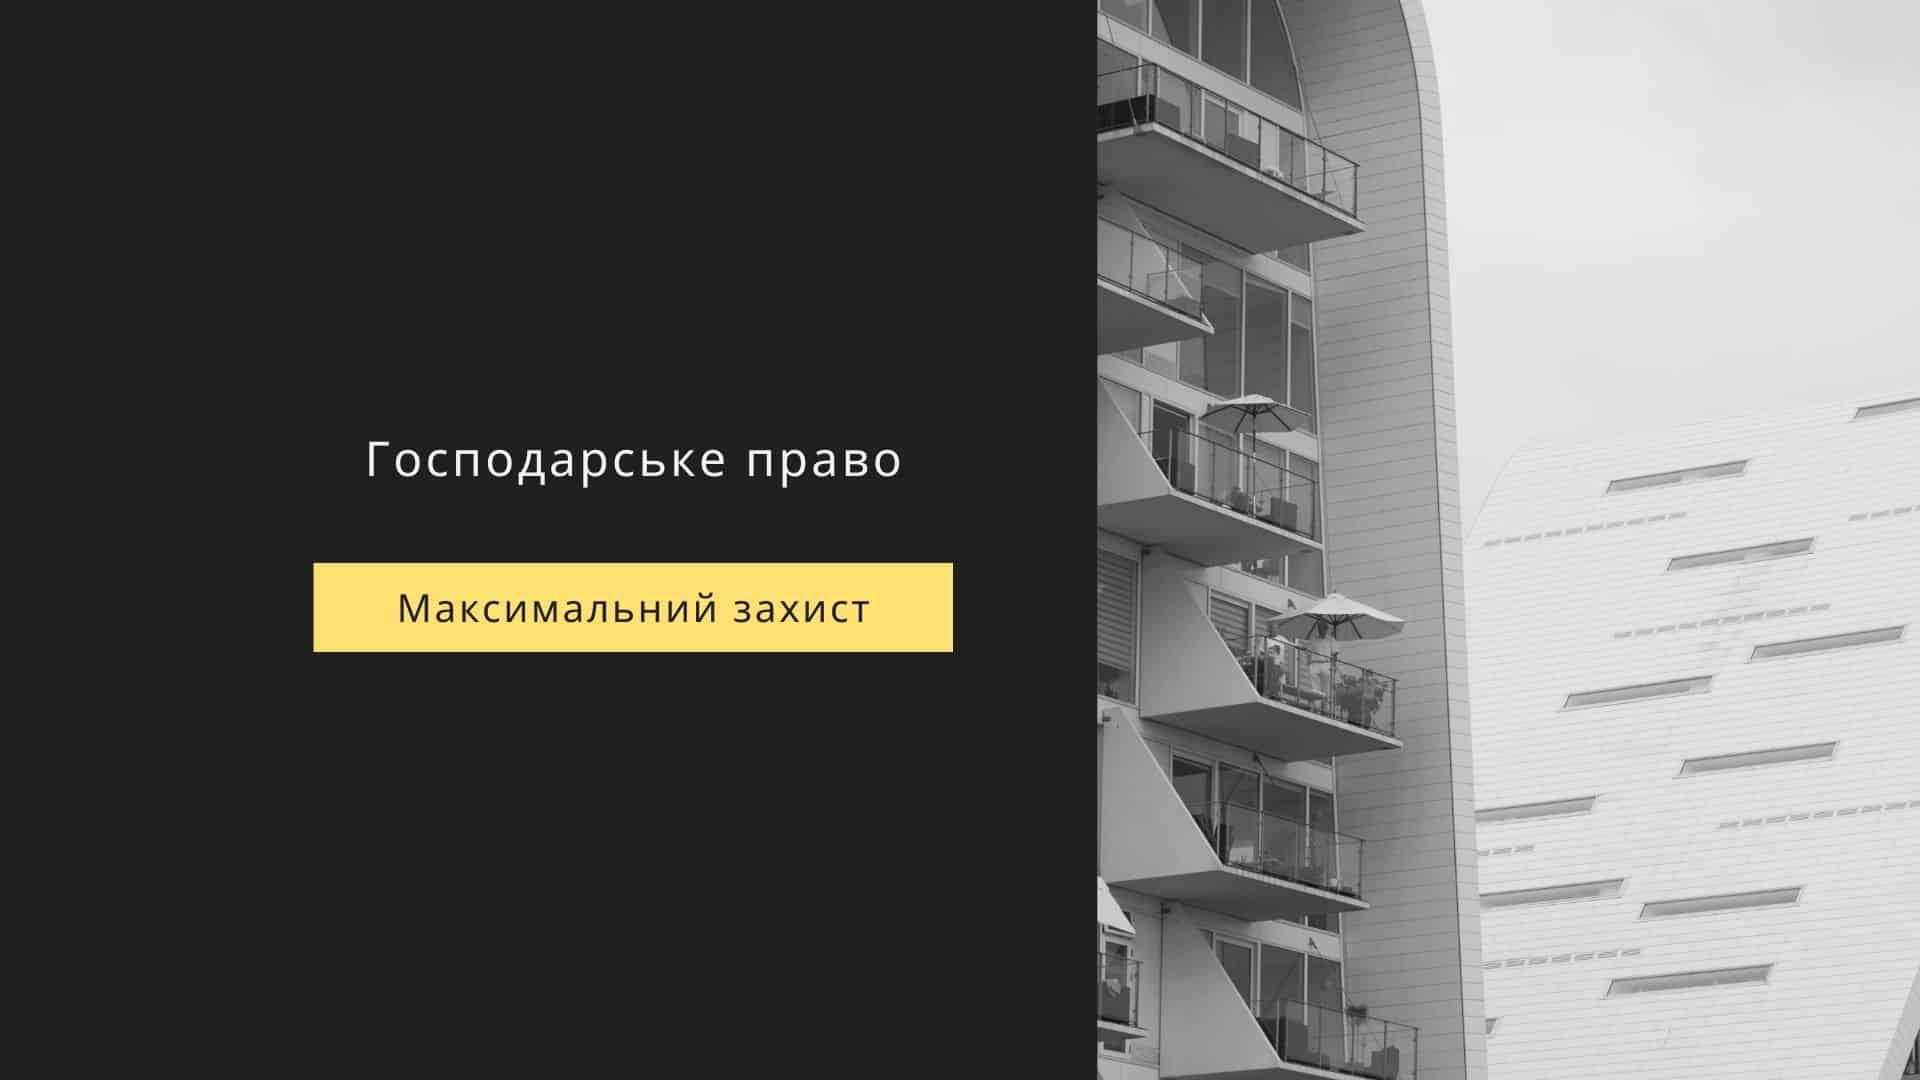 hospodarske_pravo_uk